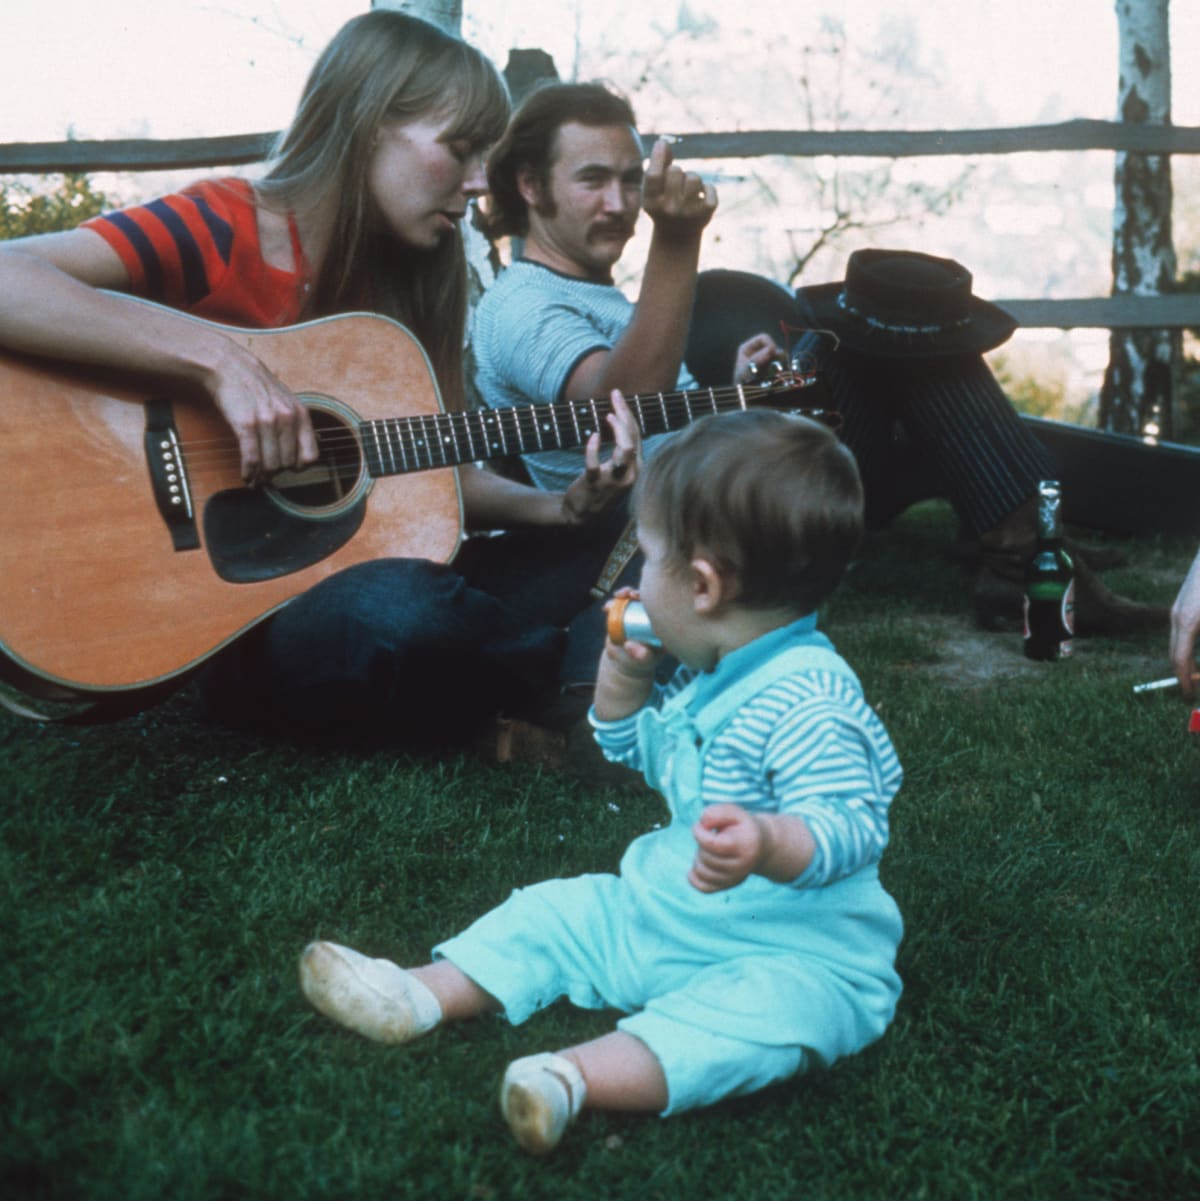 Joni Mitchell, David Crosby, and Eric Clapton at Mama Cass' house